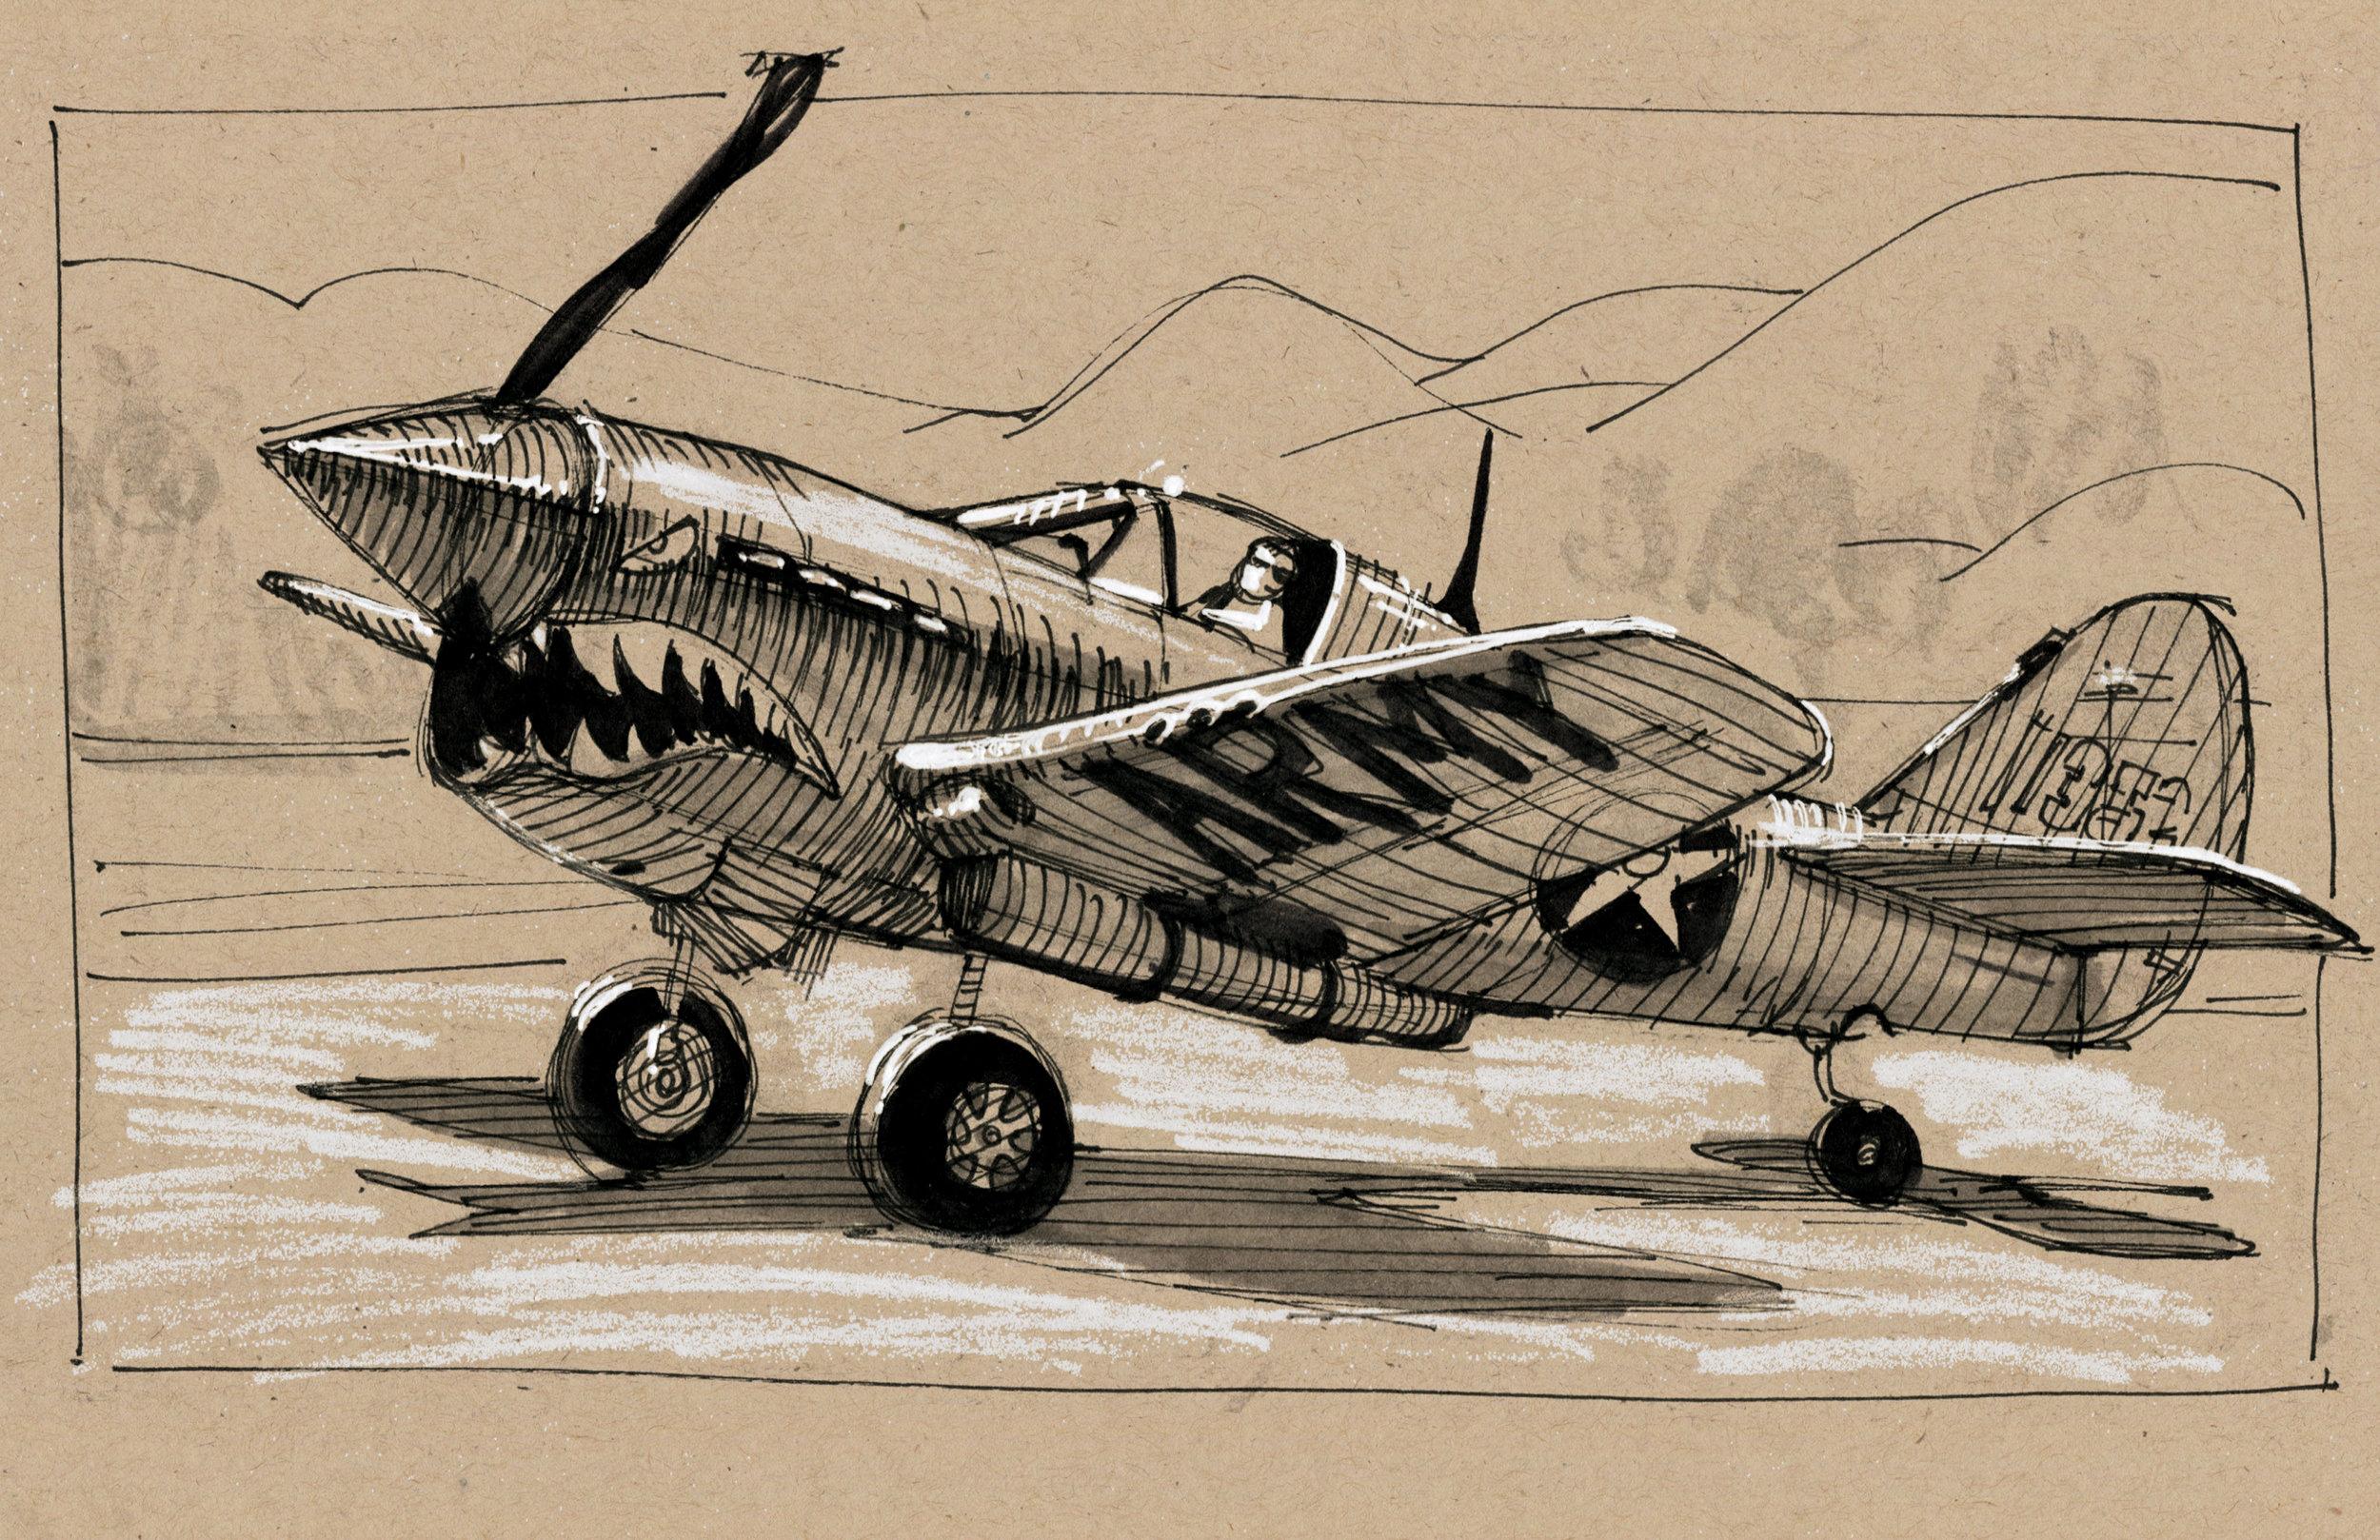 planes03.jpg